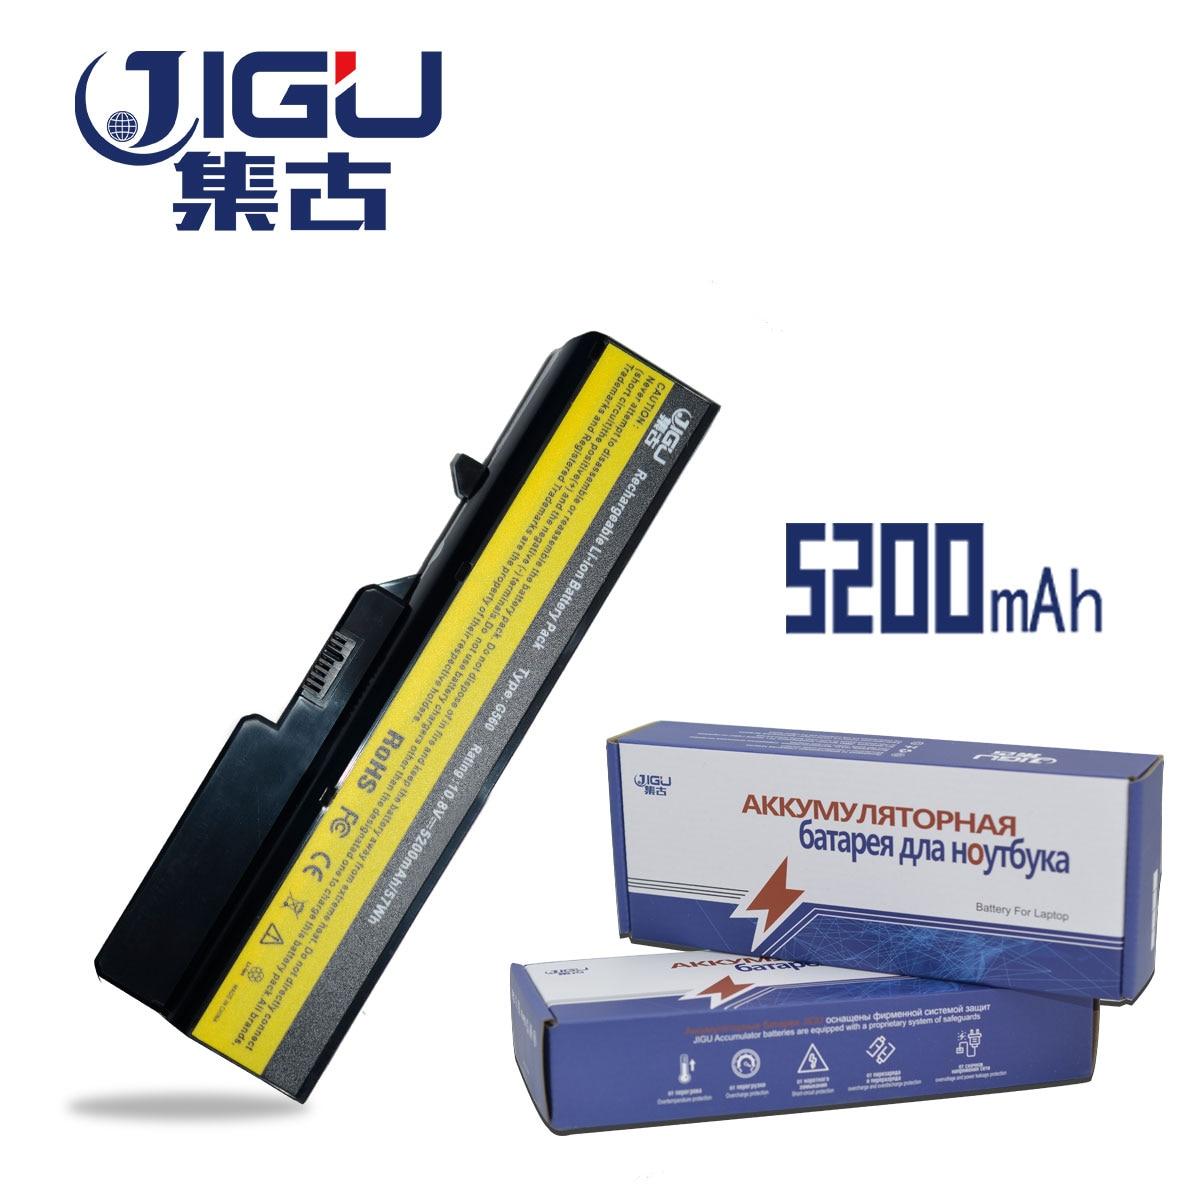 JIGU Laptop Battery For LENOVO IdeaPad G460 G465 G470 G475 G560 G565 G570 G575 G770 Z460 L09M6Y02 L10M6F21 L09S6Y02 z570 laptop battery for lenovo ideapad g460 g465 g470 g475 g560 g565 g570 g575 g770 z460 v360 v370 v470 l09m6y02 l10m6f21 l09s6y02